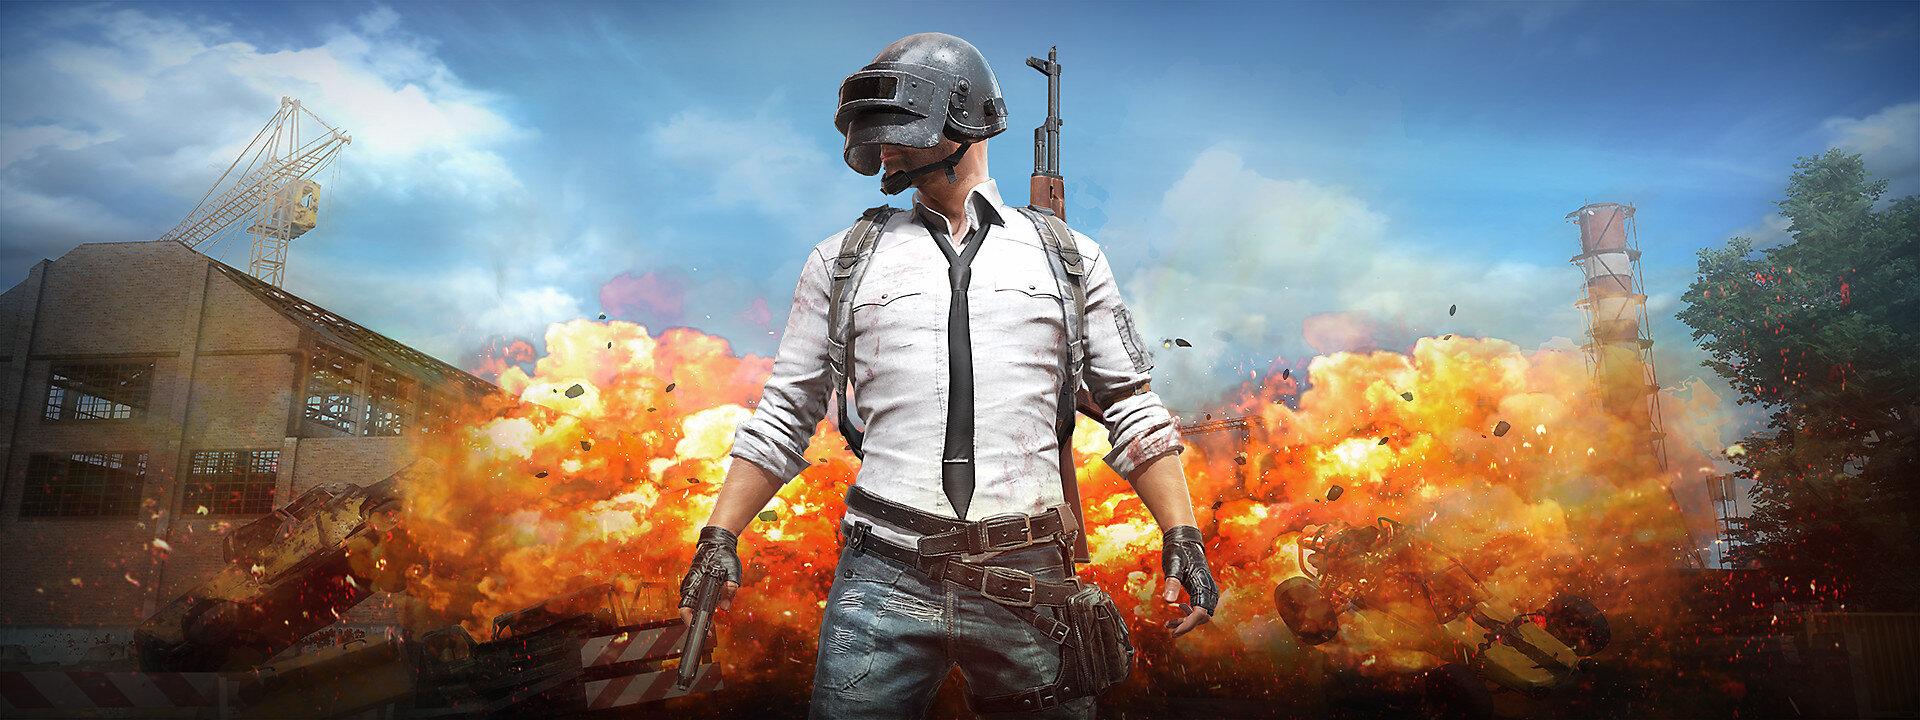 playerunknowns-battlegrounds-normal-hero-background-01-ps4-09nov18.jpeg